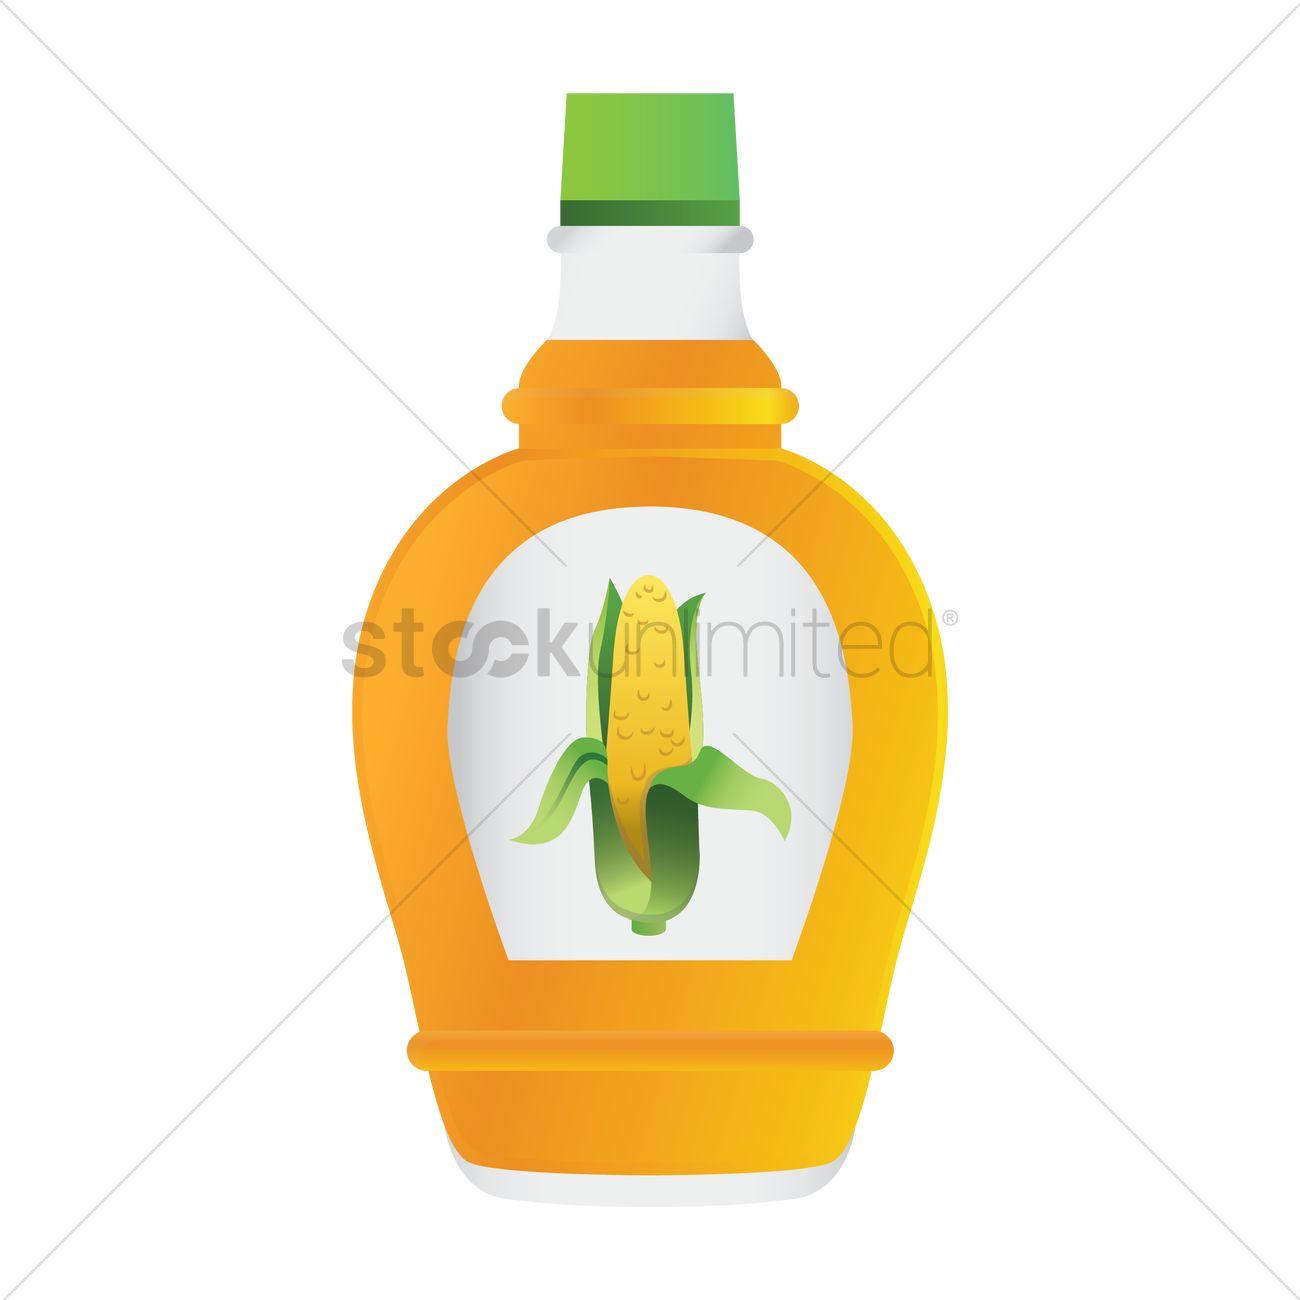 1300x1300 Corn Syrup Vector Image